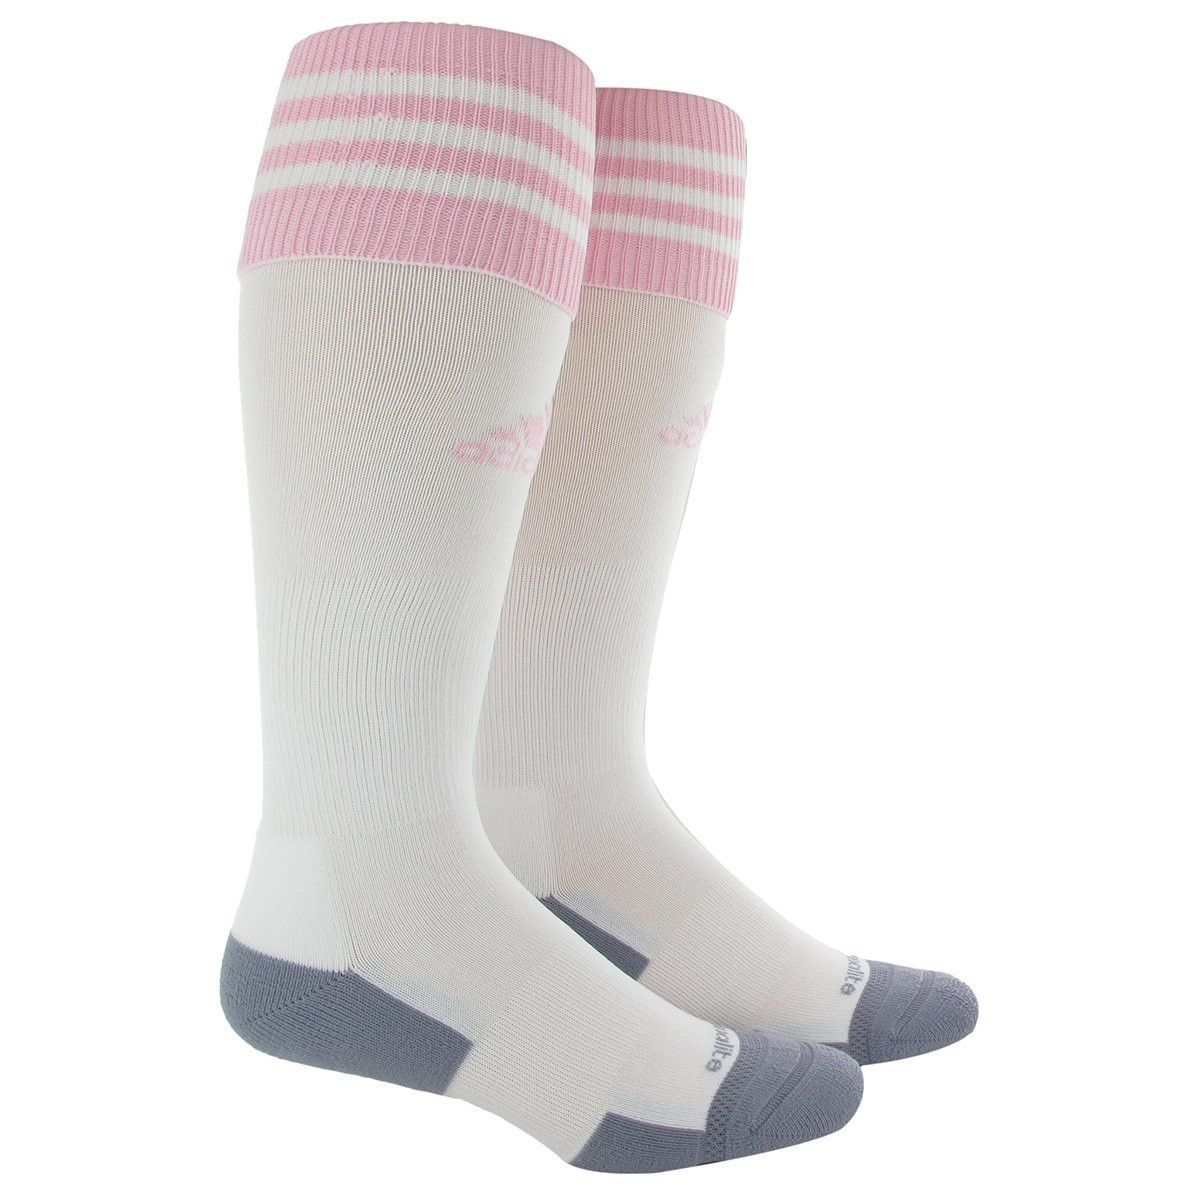 Adidas Copa Zone Cushion 2.0 Socks (White/Pink) Socks